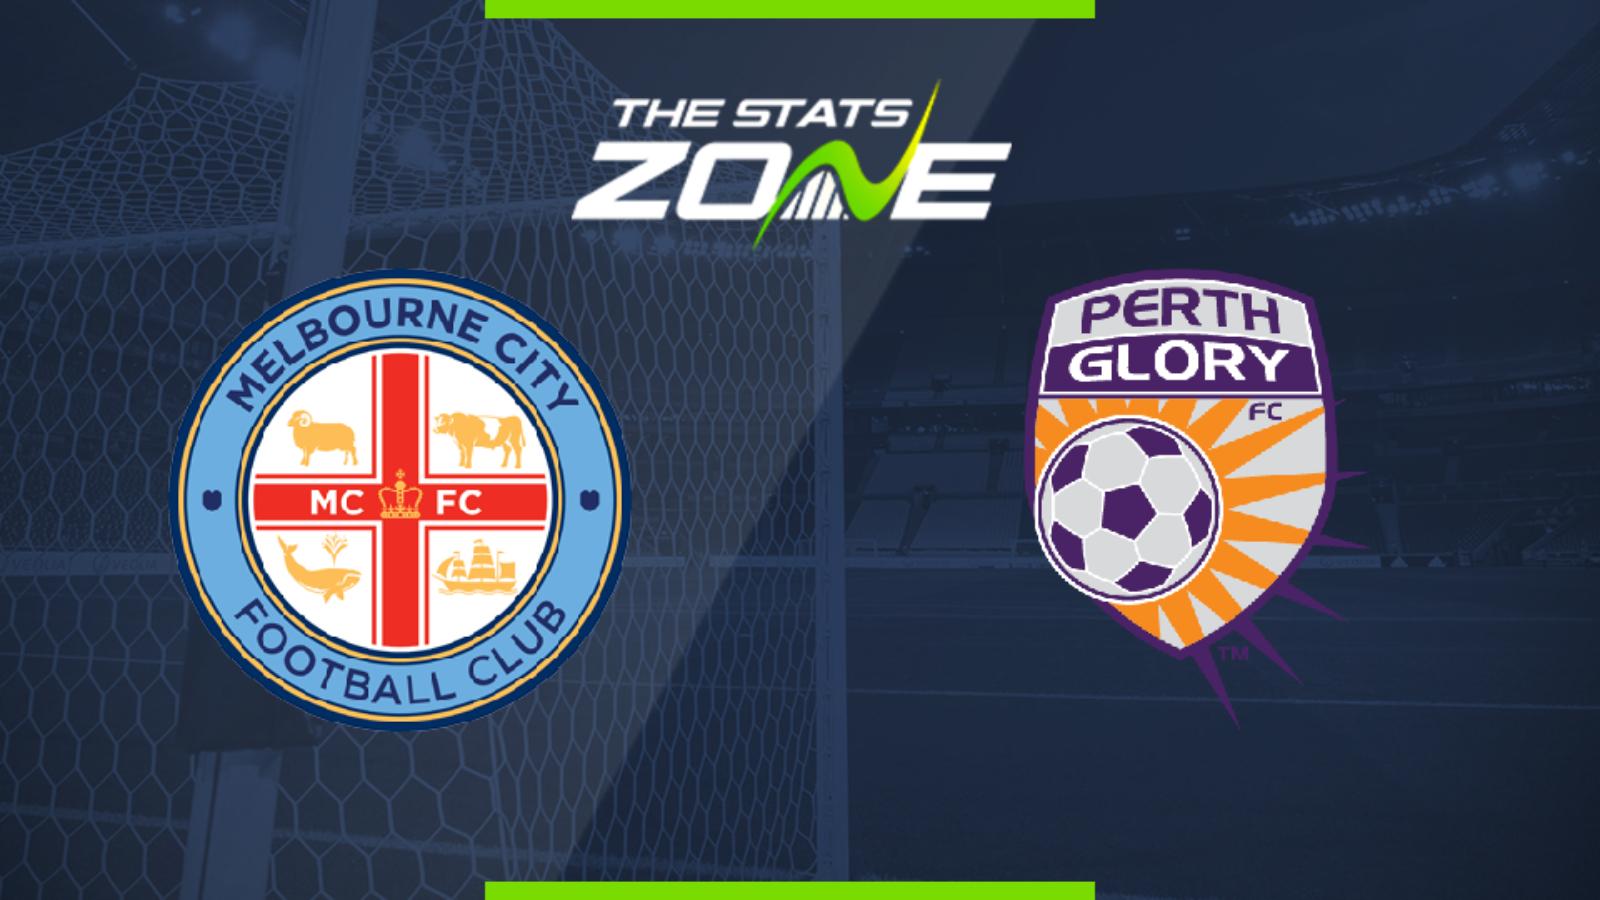 perth glory vs melbourne city bettingexpert football